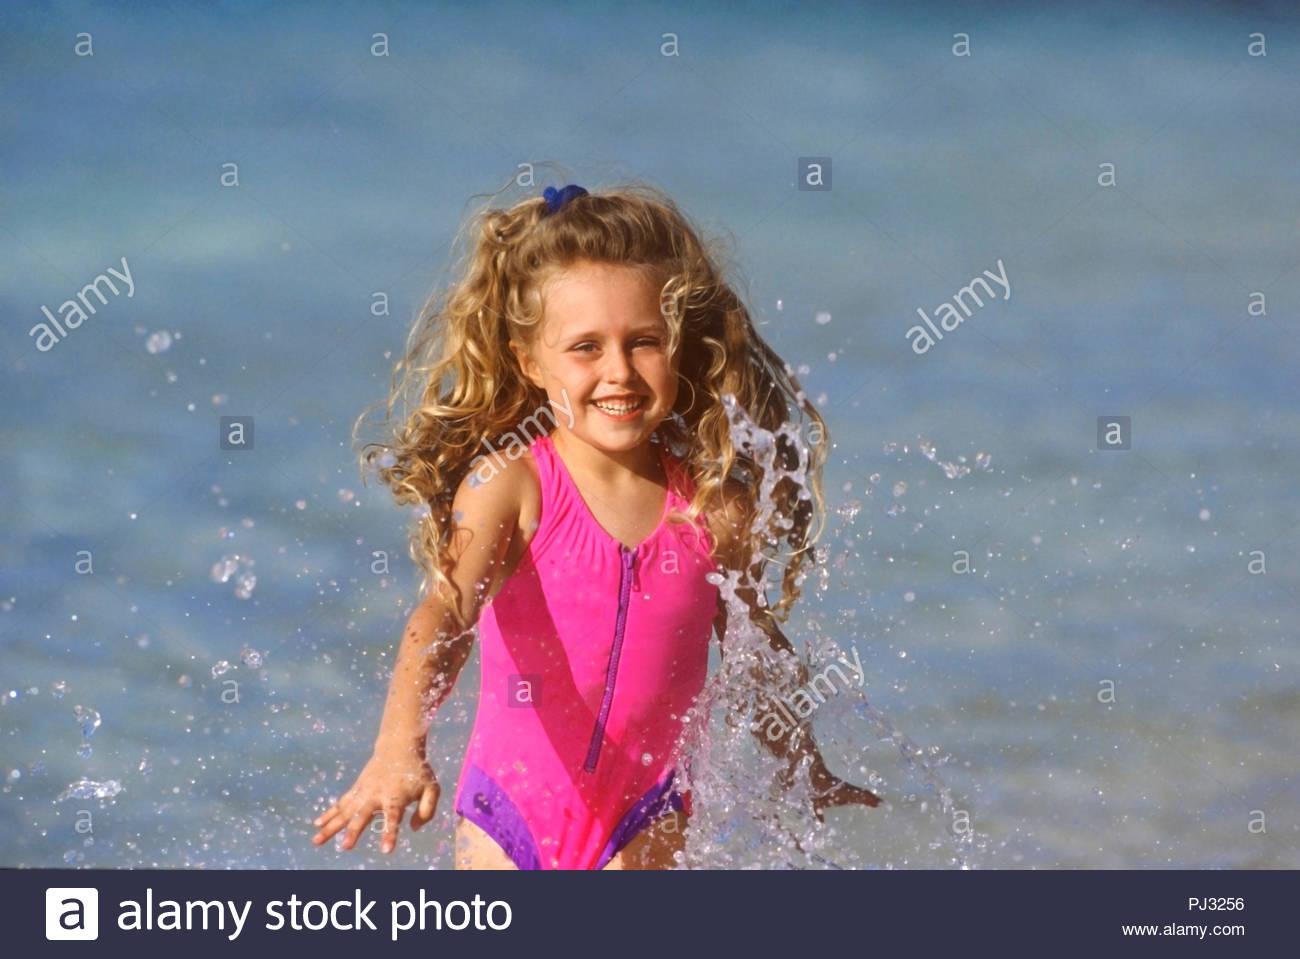 girl splashing in waves on beach Stock Photo